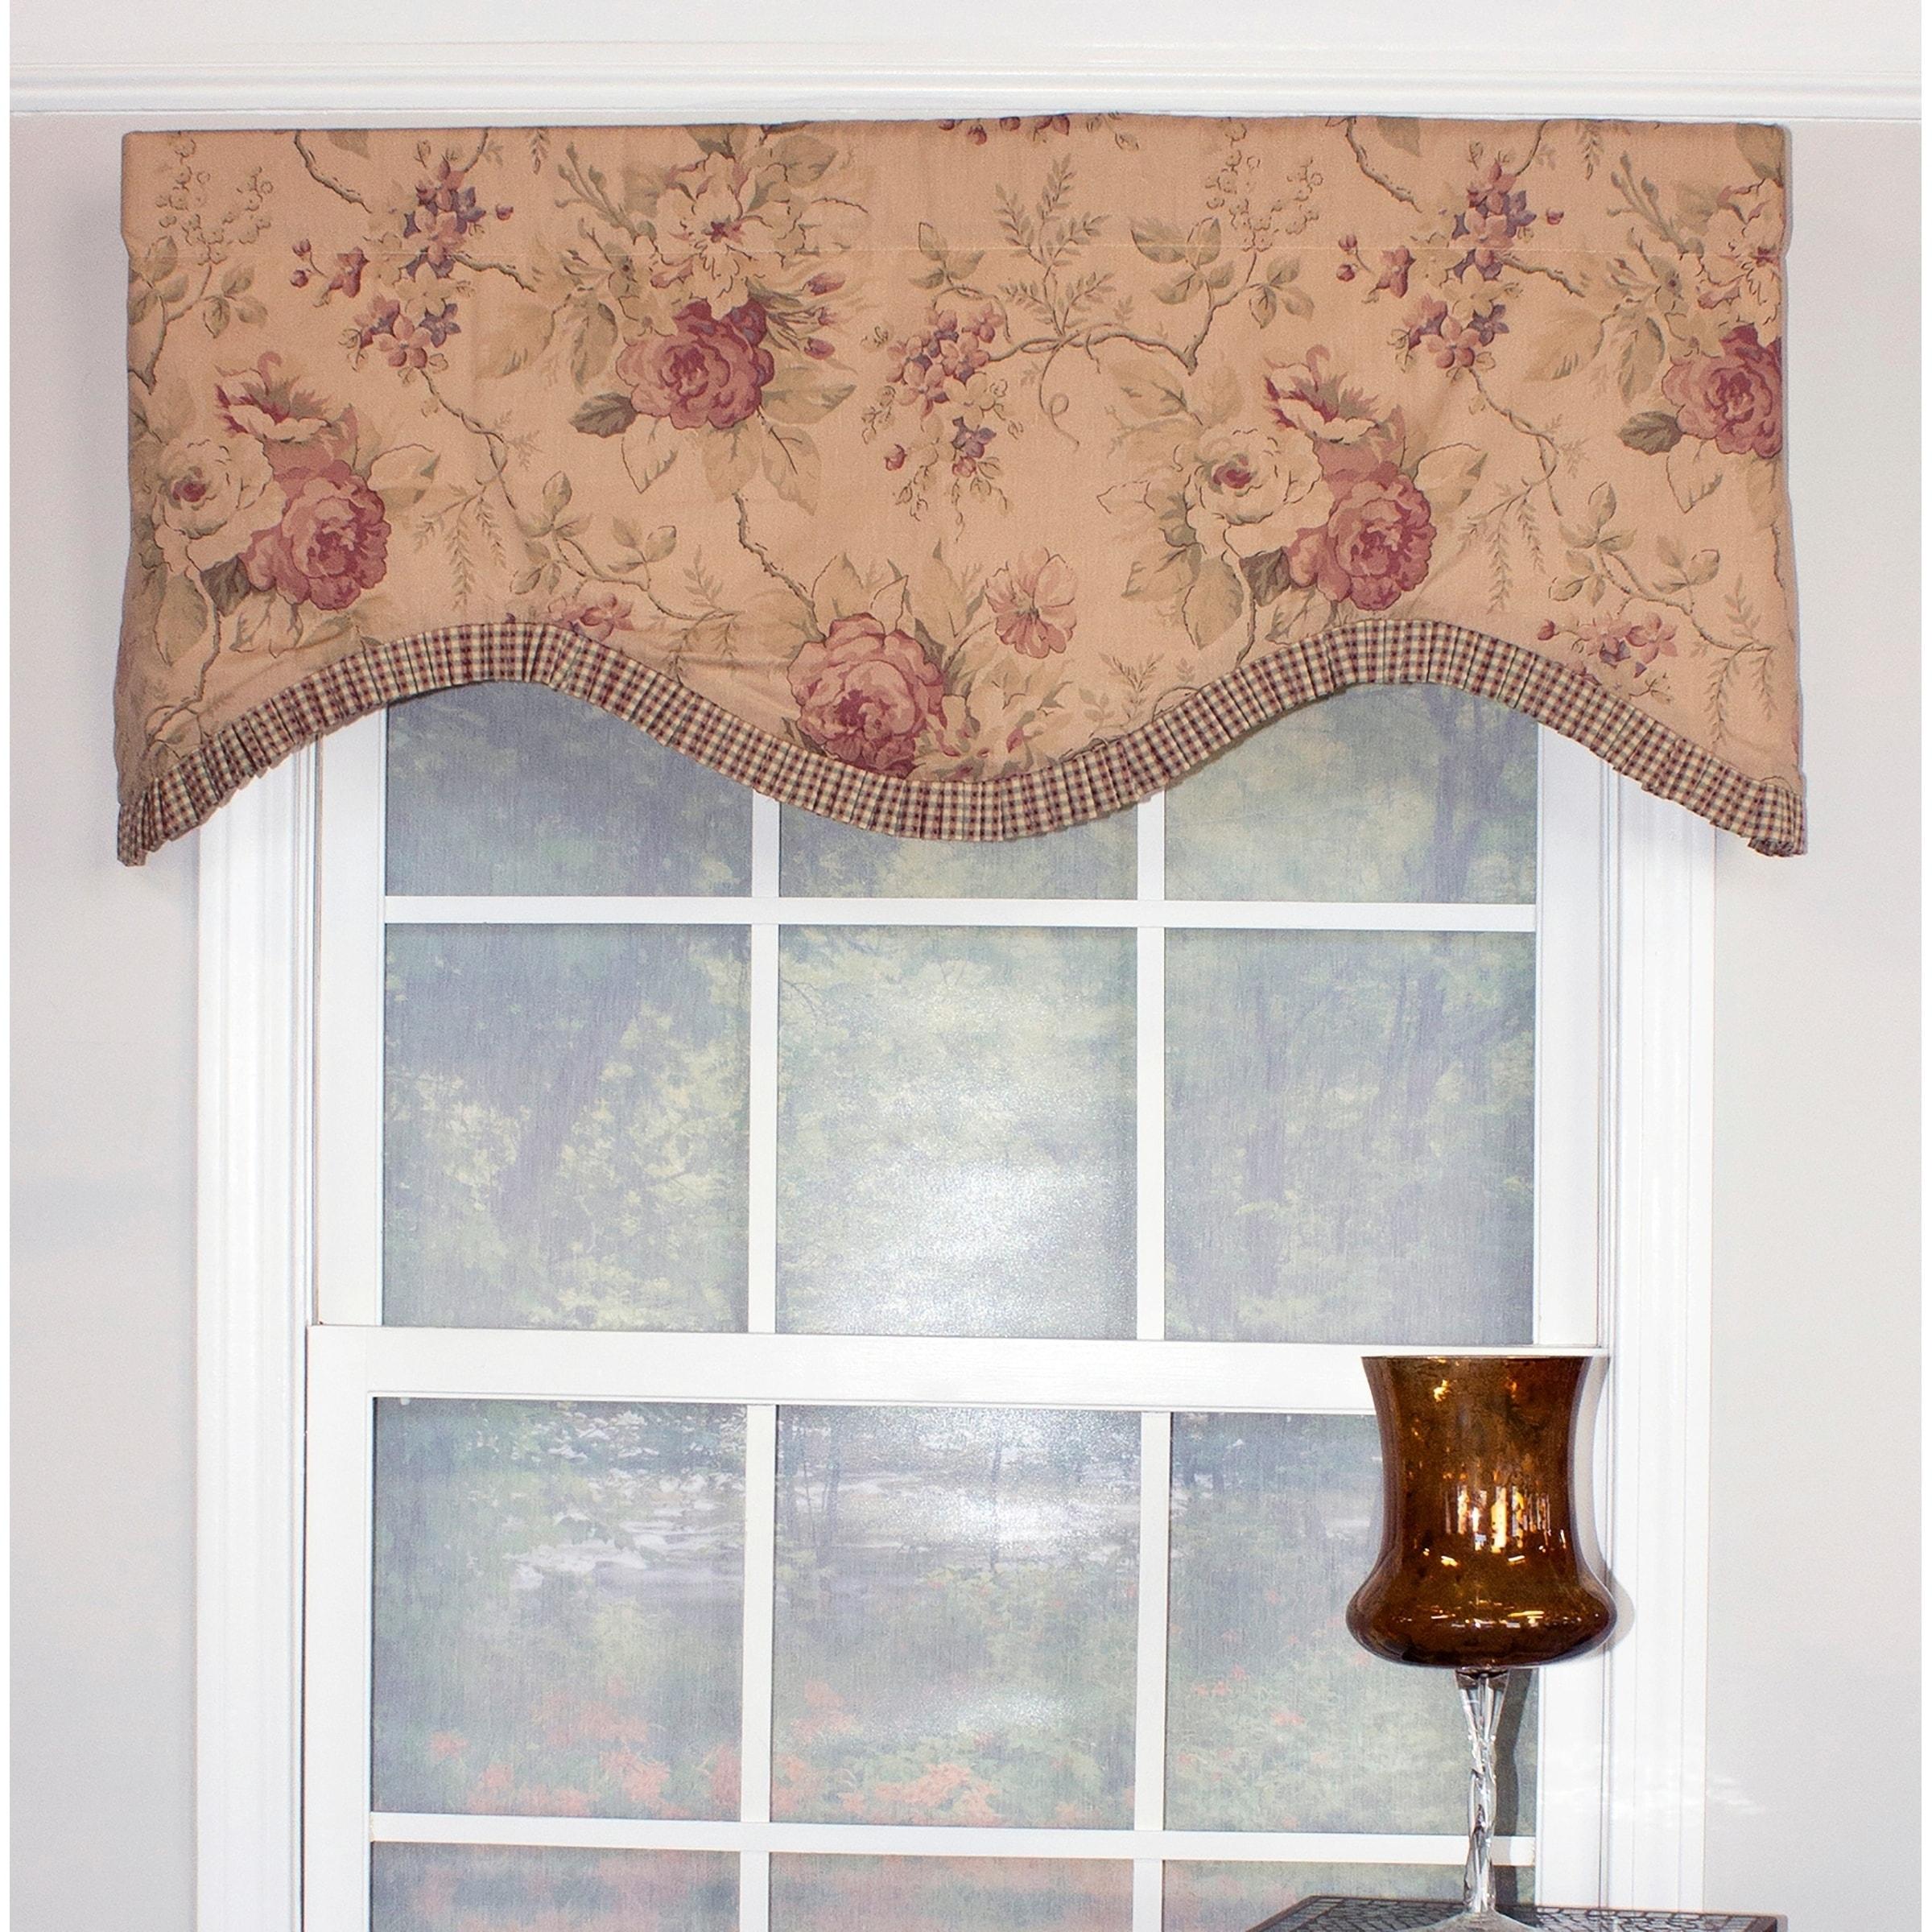 Madison Art Center Design: Crown Molding Cornice Window Treatments